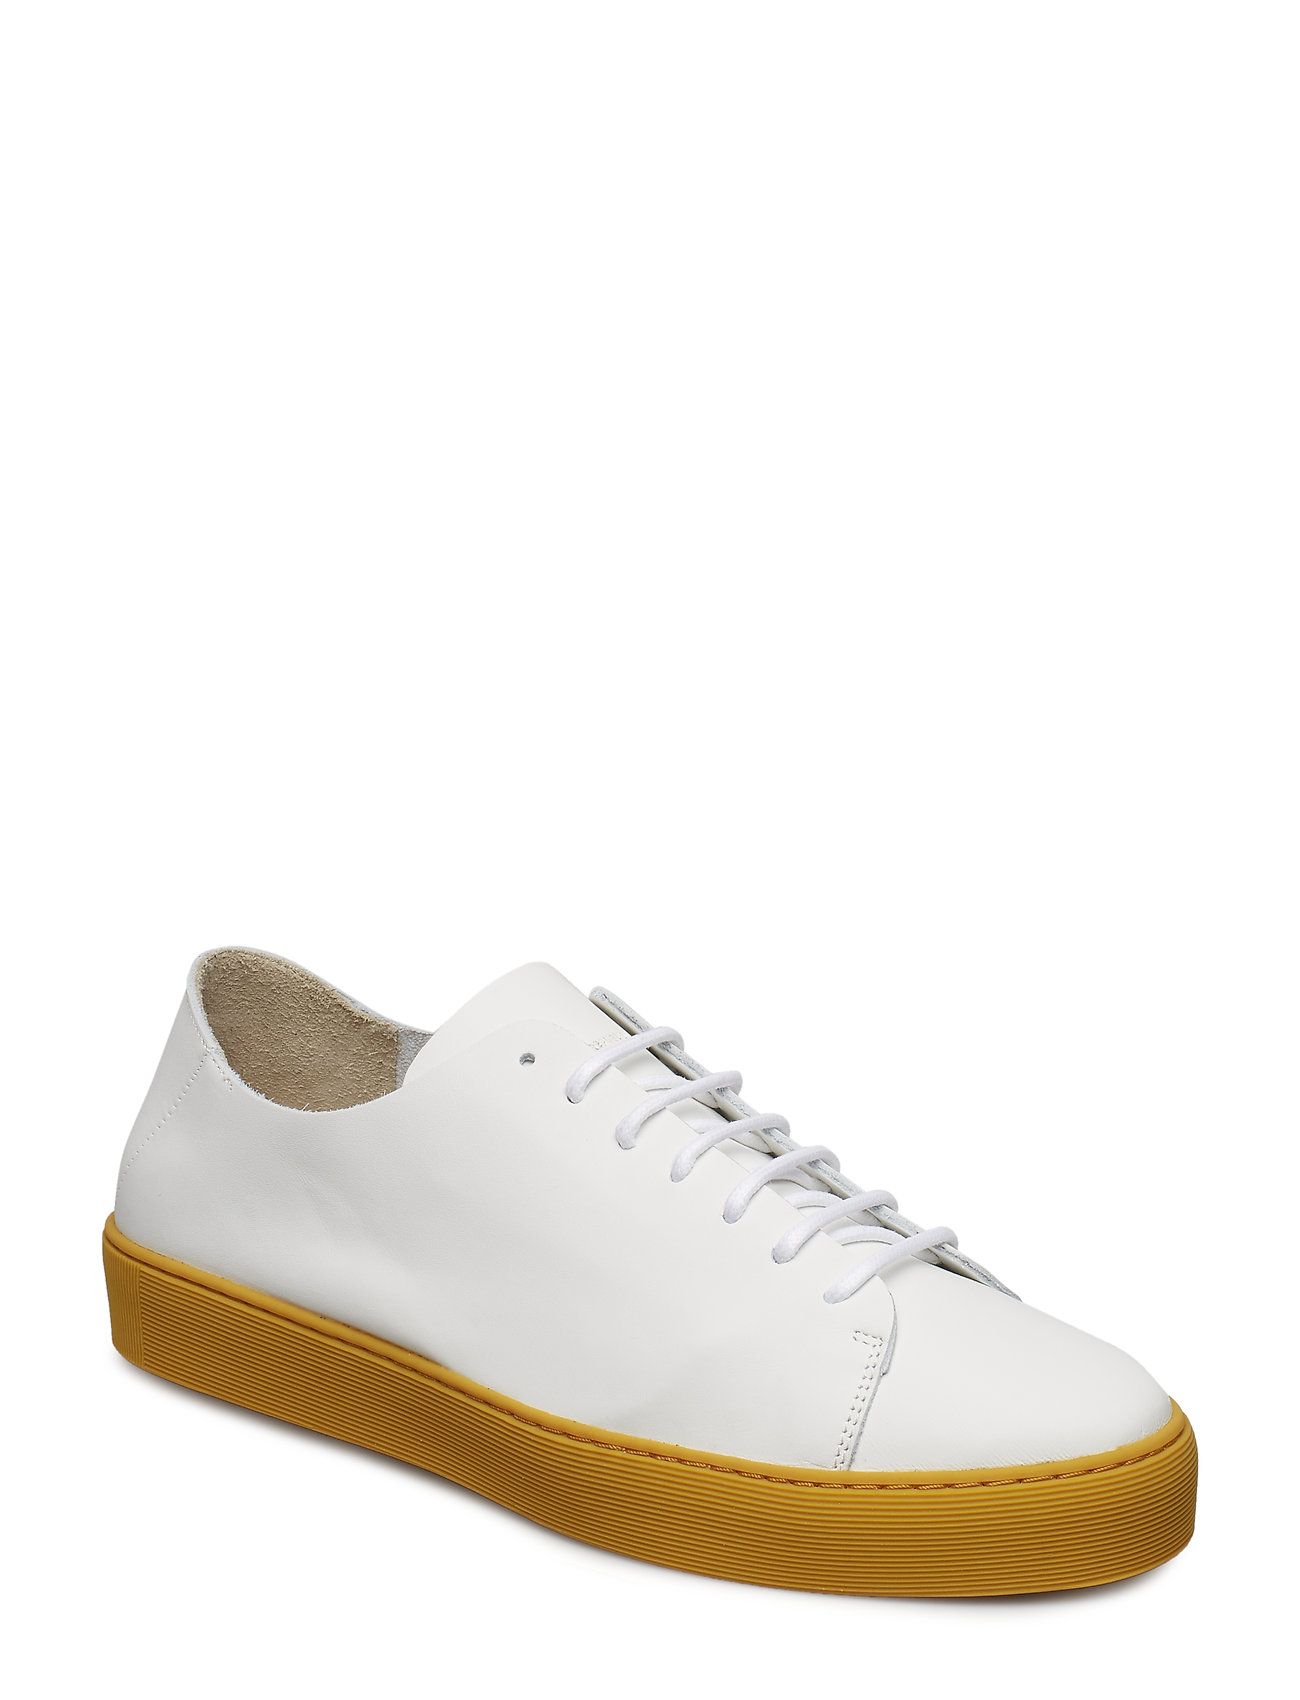 Image of Doric Impact Derby Shoe Low-top Sneakers Hvid Royal RepubliQ (3142010771)